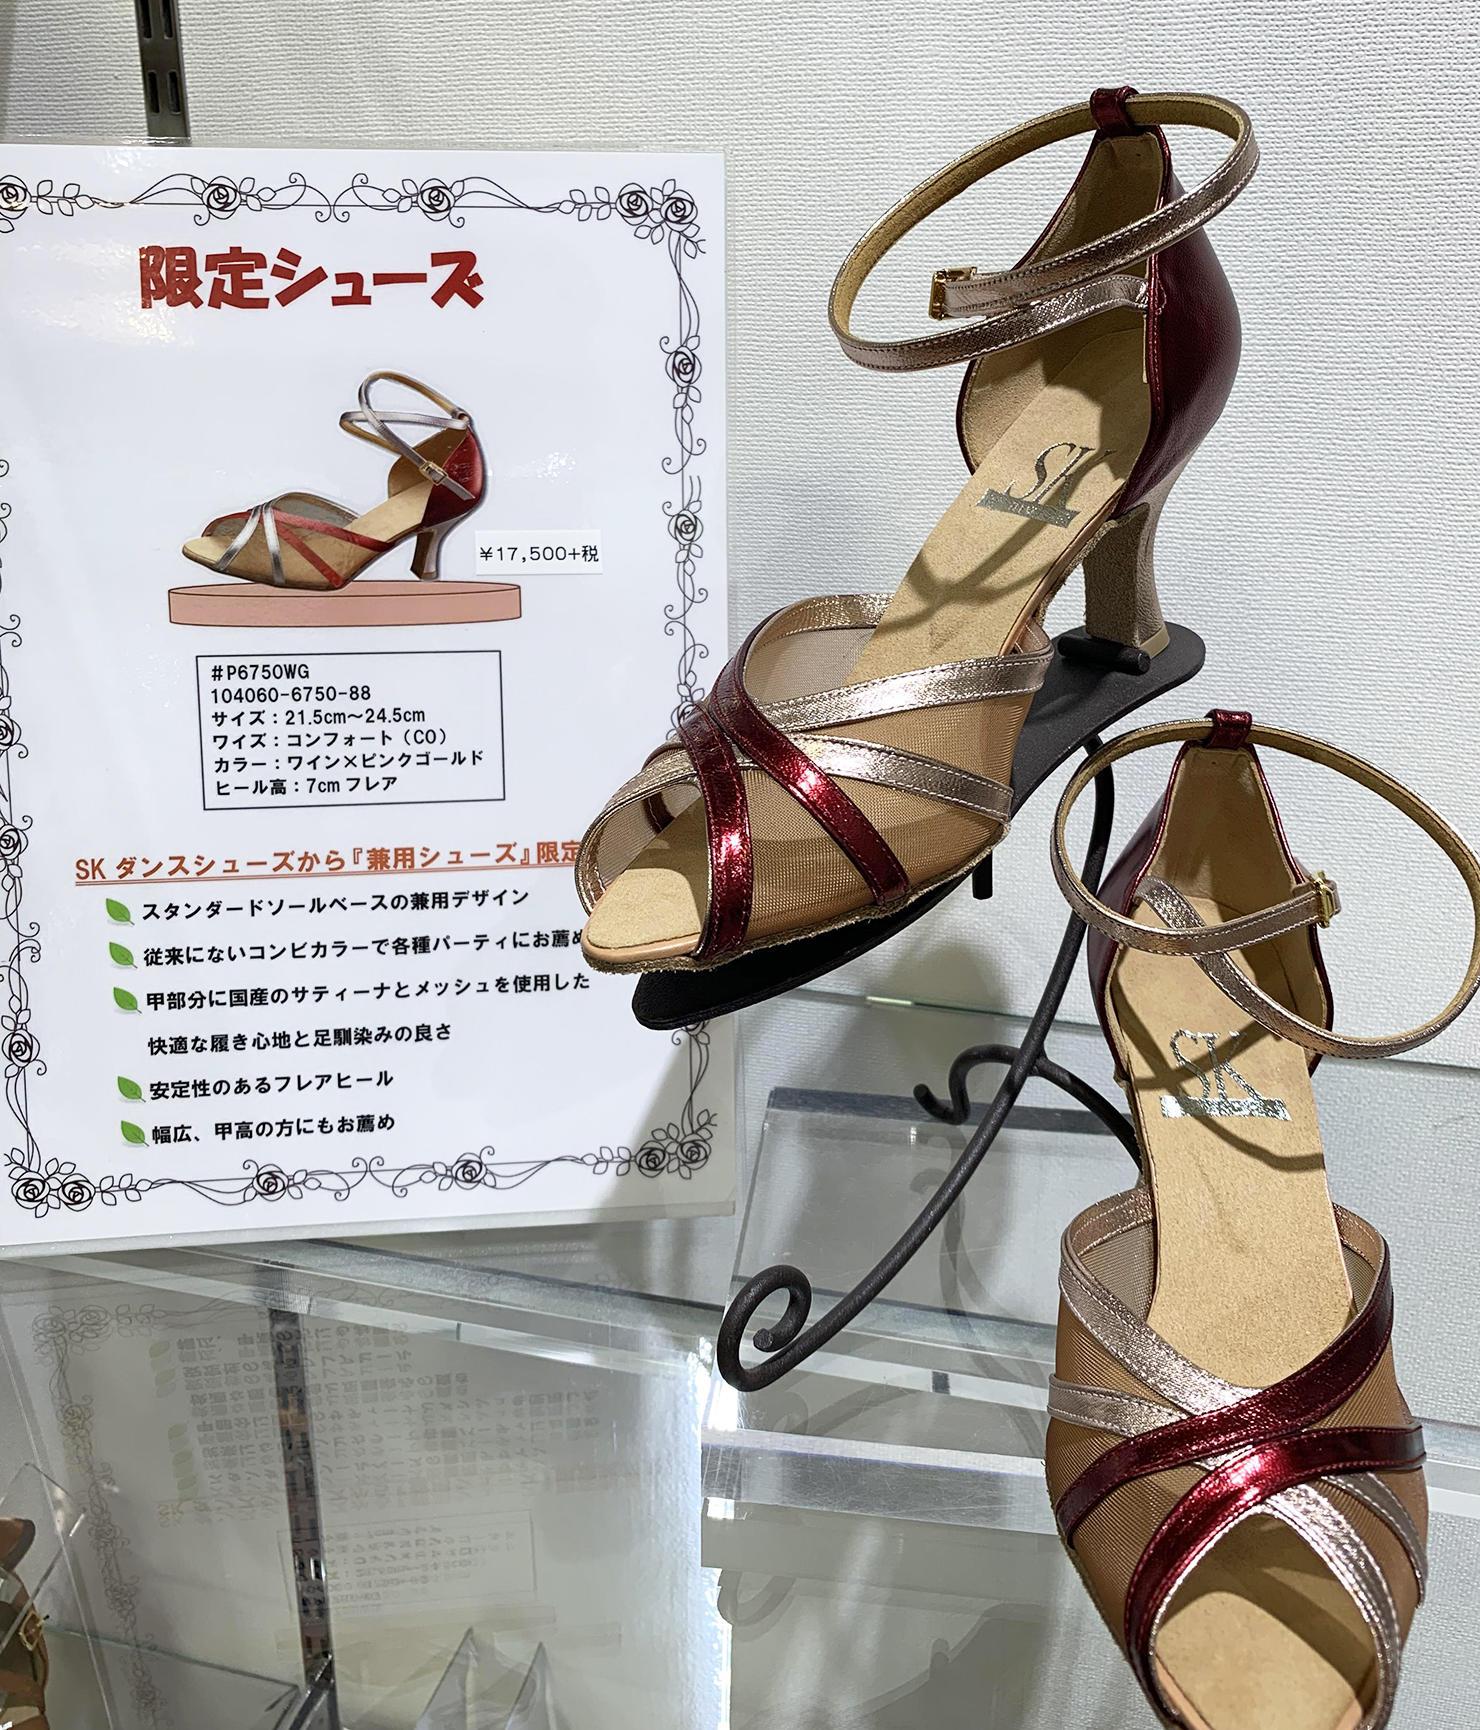 0125_skdanceshoes_nagoya02.jpg